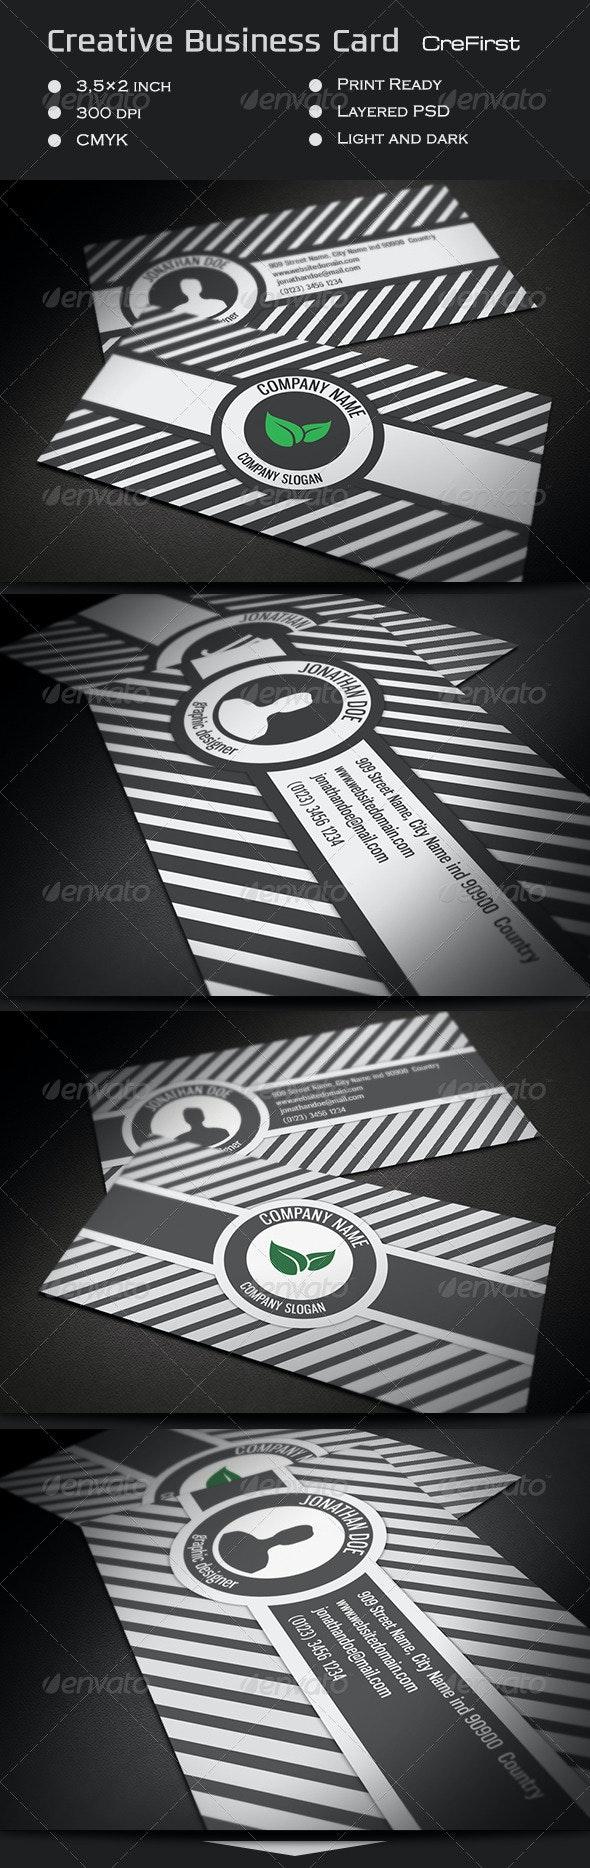 Creative Business Card CreFirst - Creative Business Cards